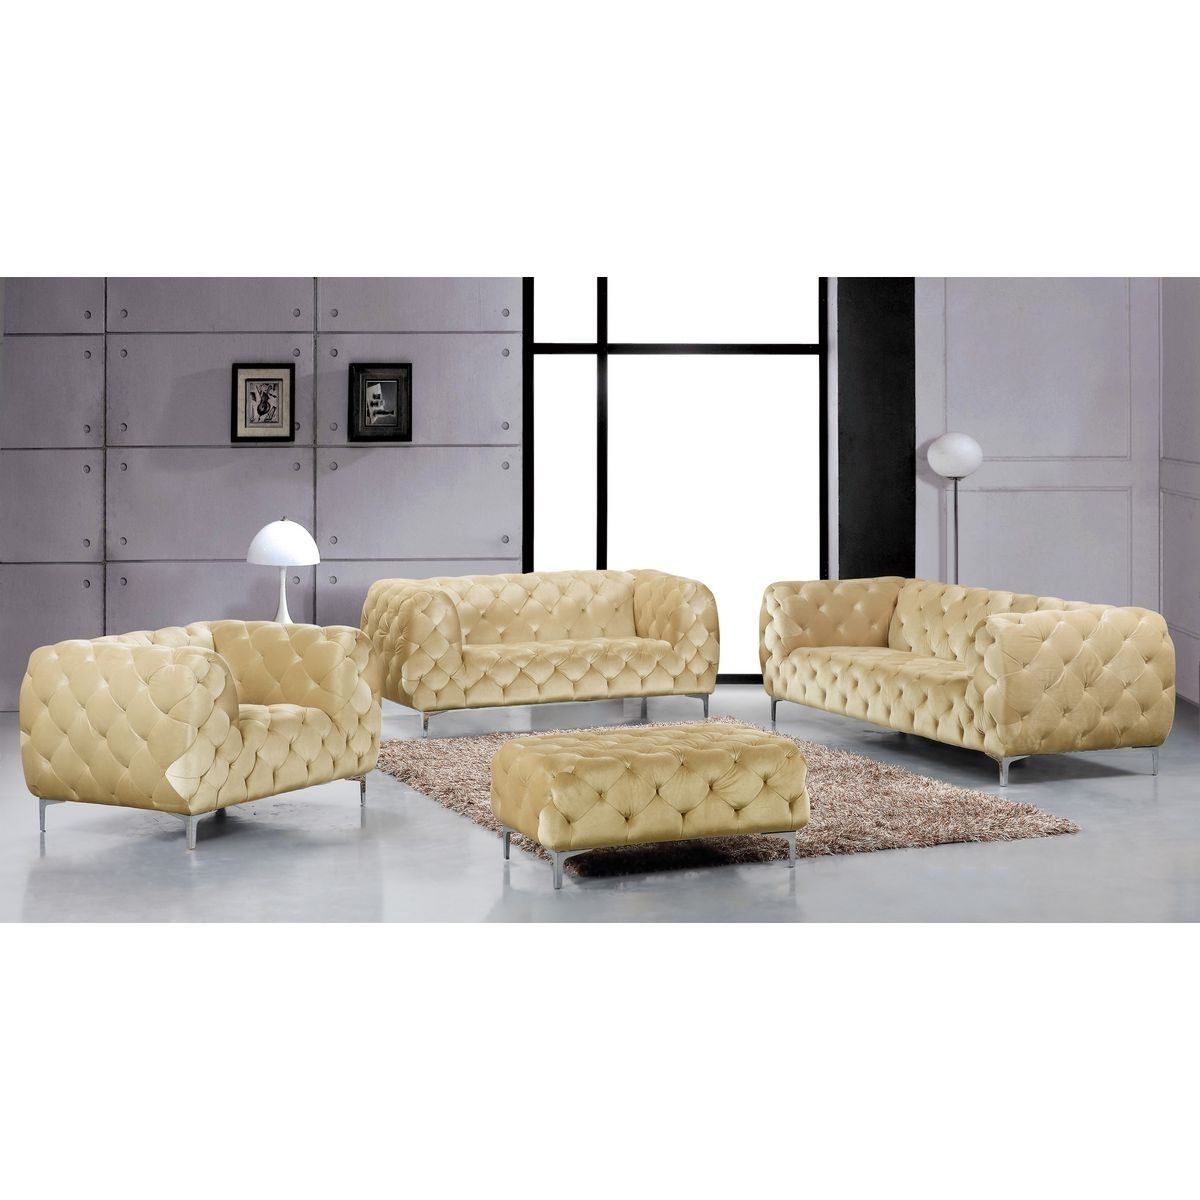 Latest Kijiji Kitchener Sectional Sofas Inside Furniture : Green Tufted Chaise Lounge Furniture Making Ottawa (View 4 of 15)